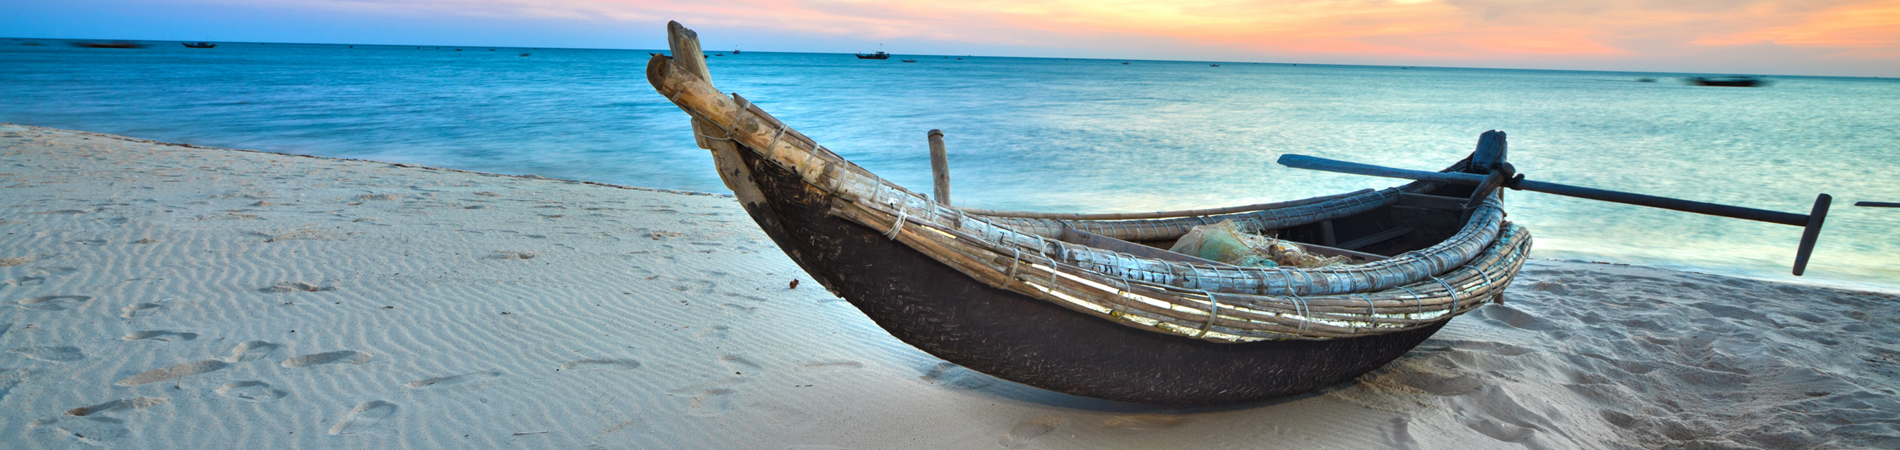 shutterstock_vietnam boat beach header